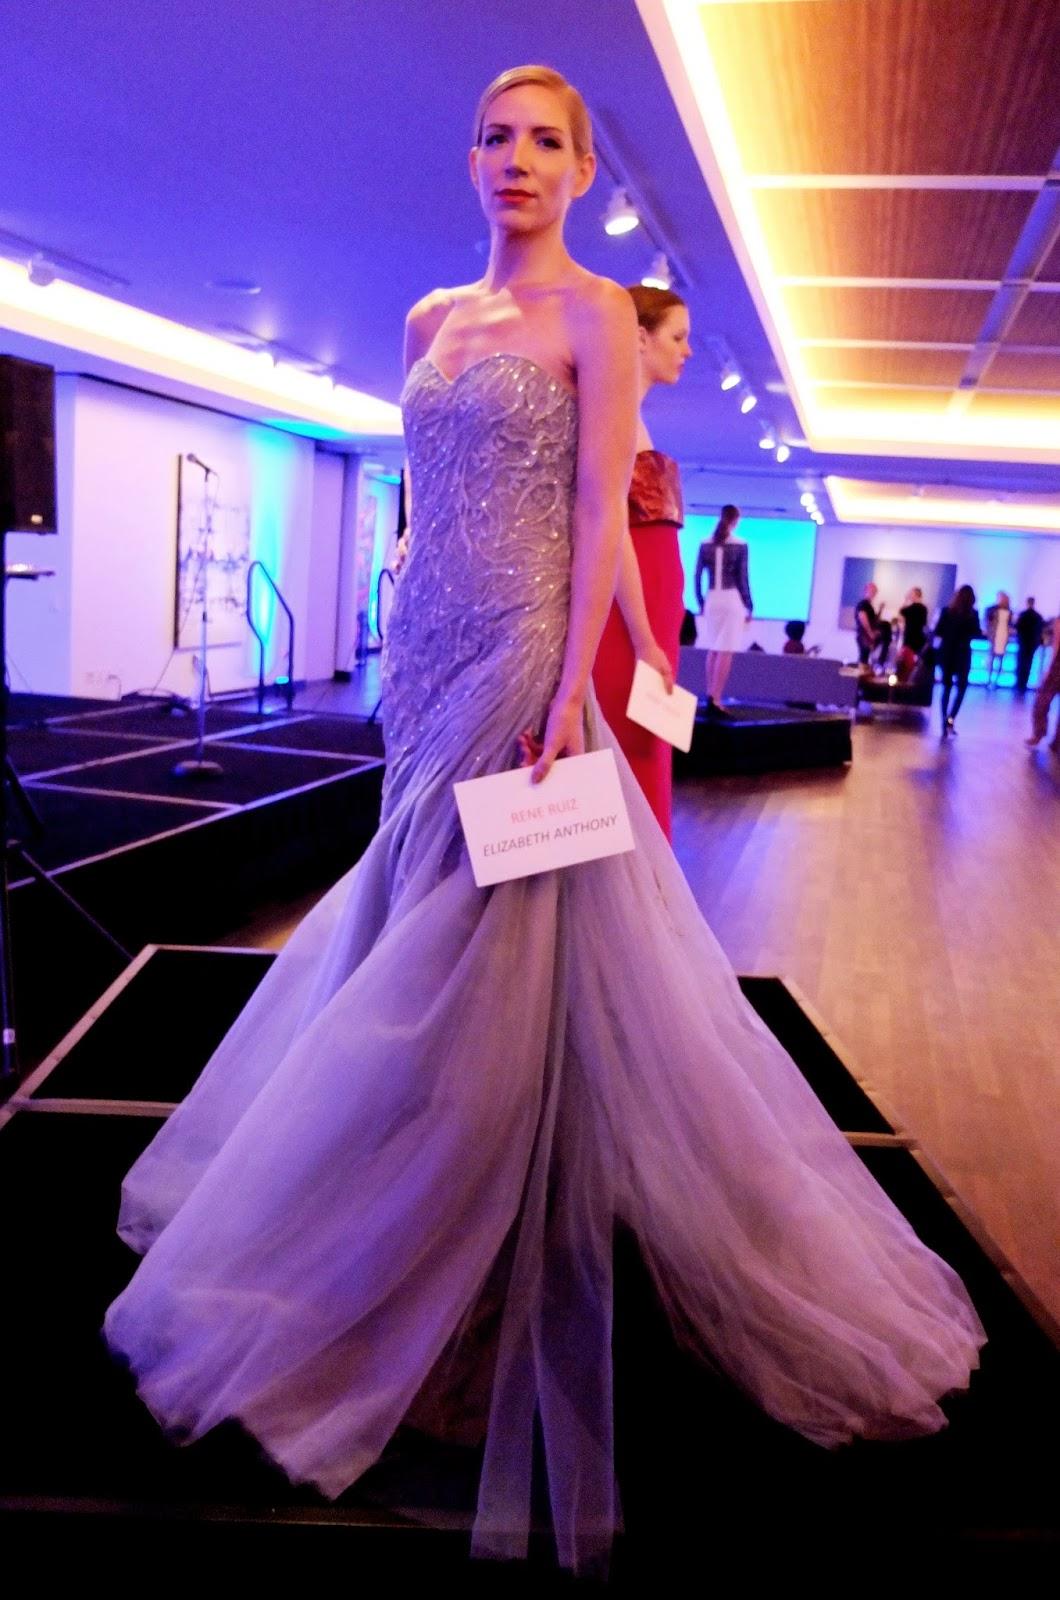 Fashion Houston Row Call, Fashion Houston Five, Rene Ruiz Fashion Houston